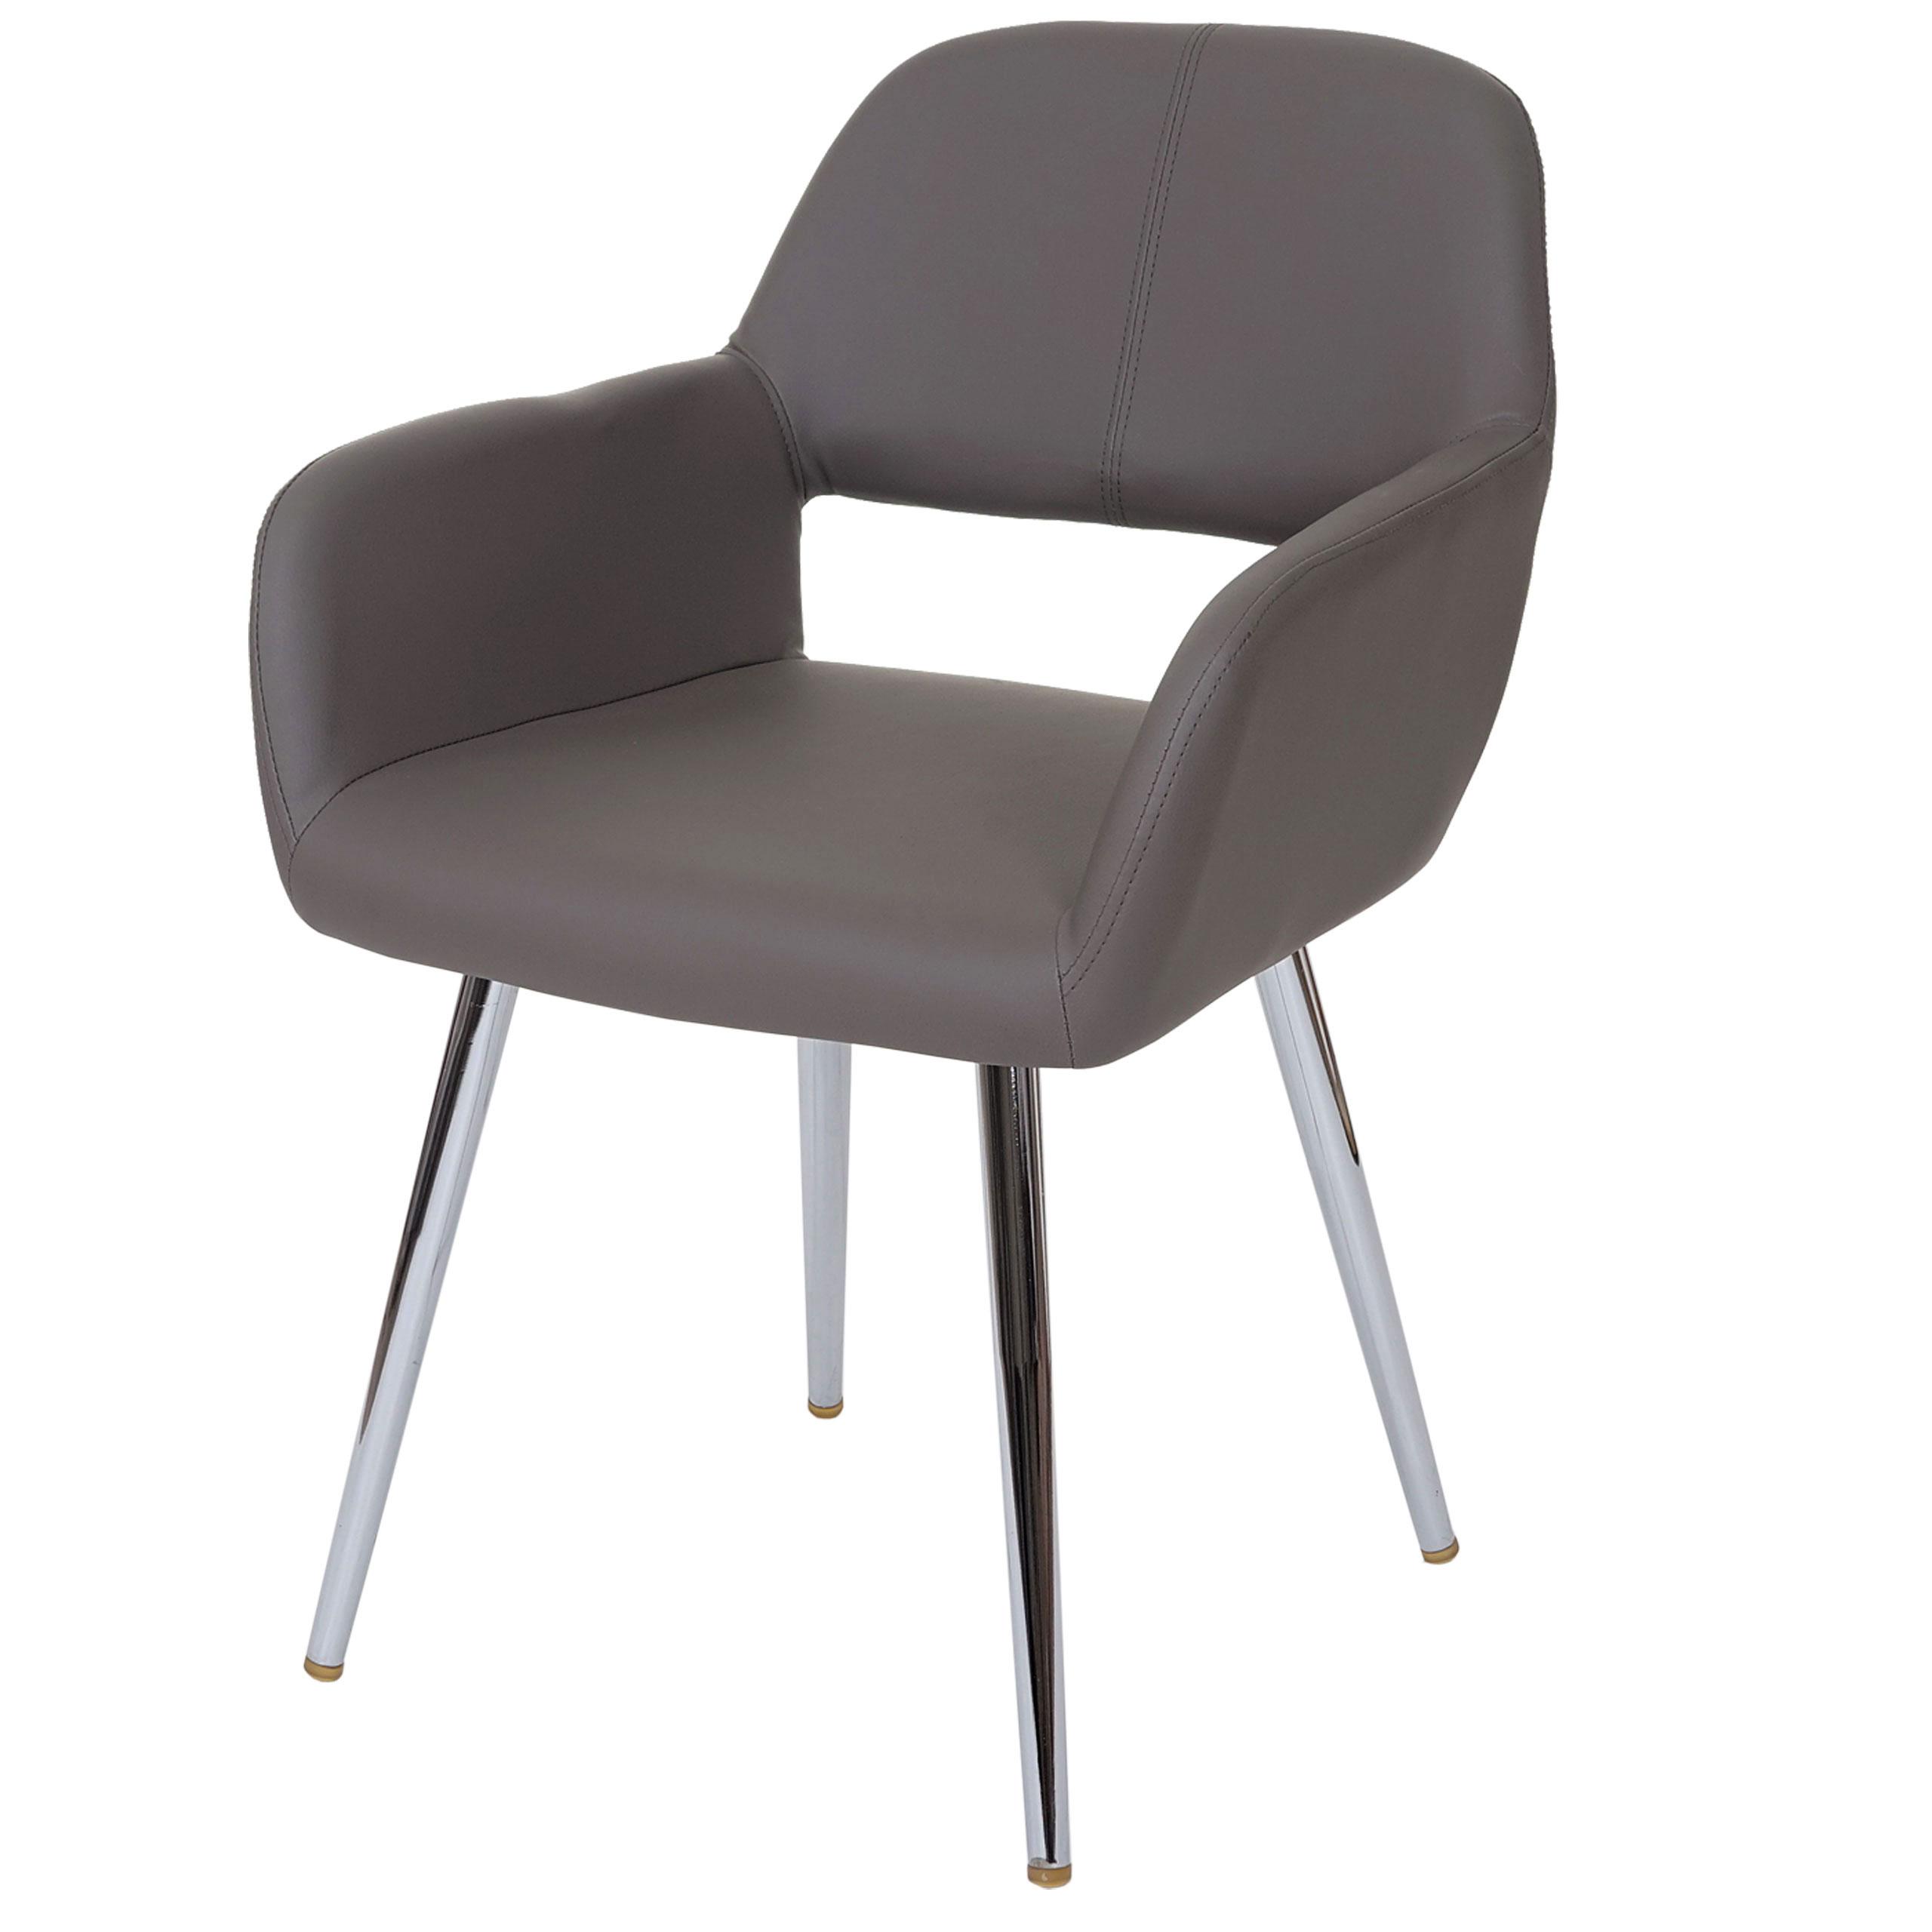 Sedia lounge hwc a50 design moderno ecopelle sala pranzo for Sedia design pranzo